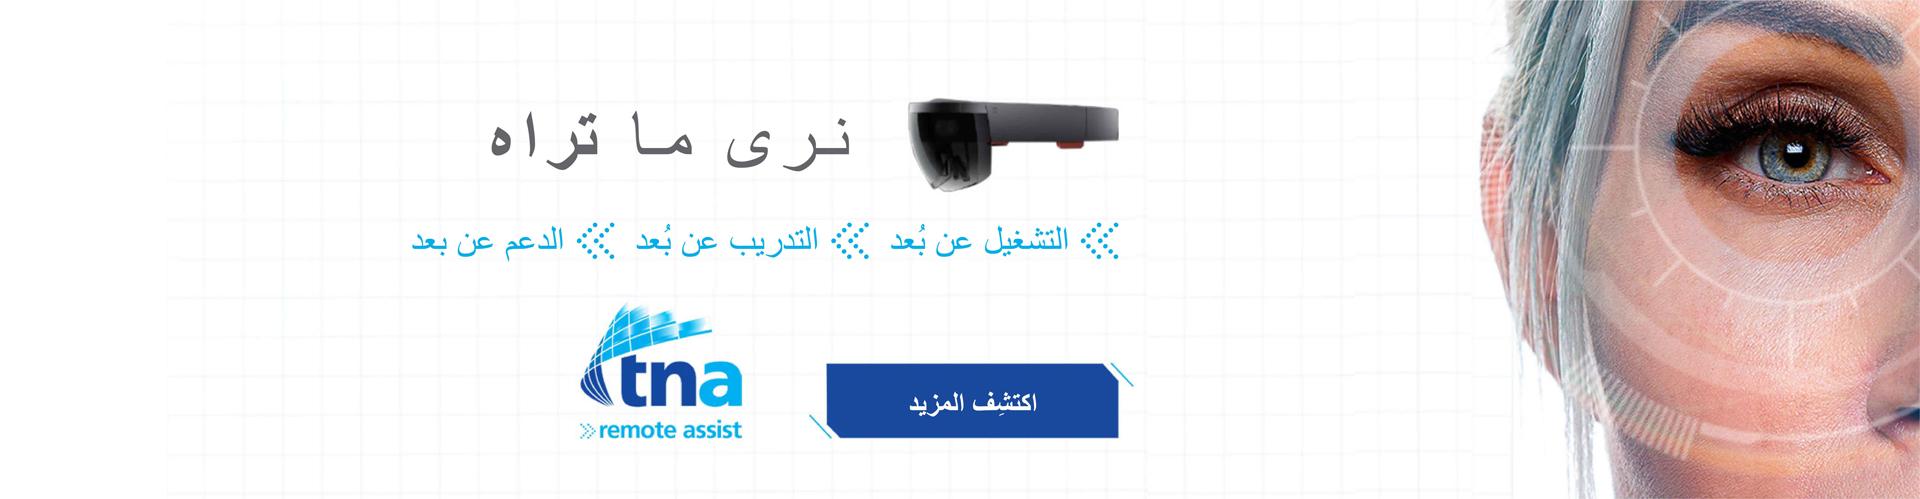 Website banner 03